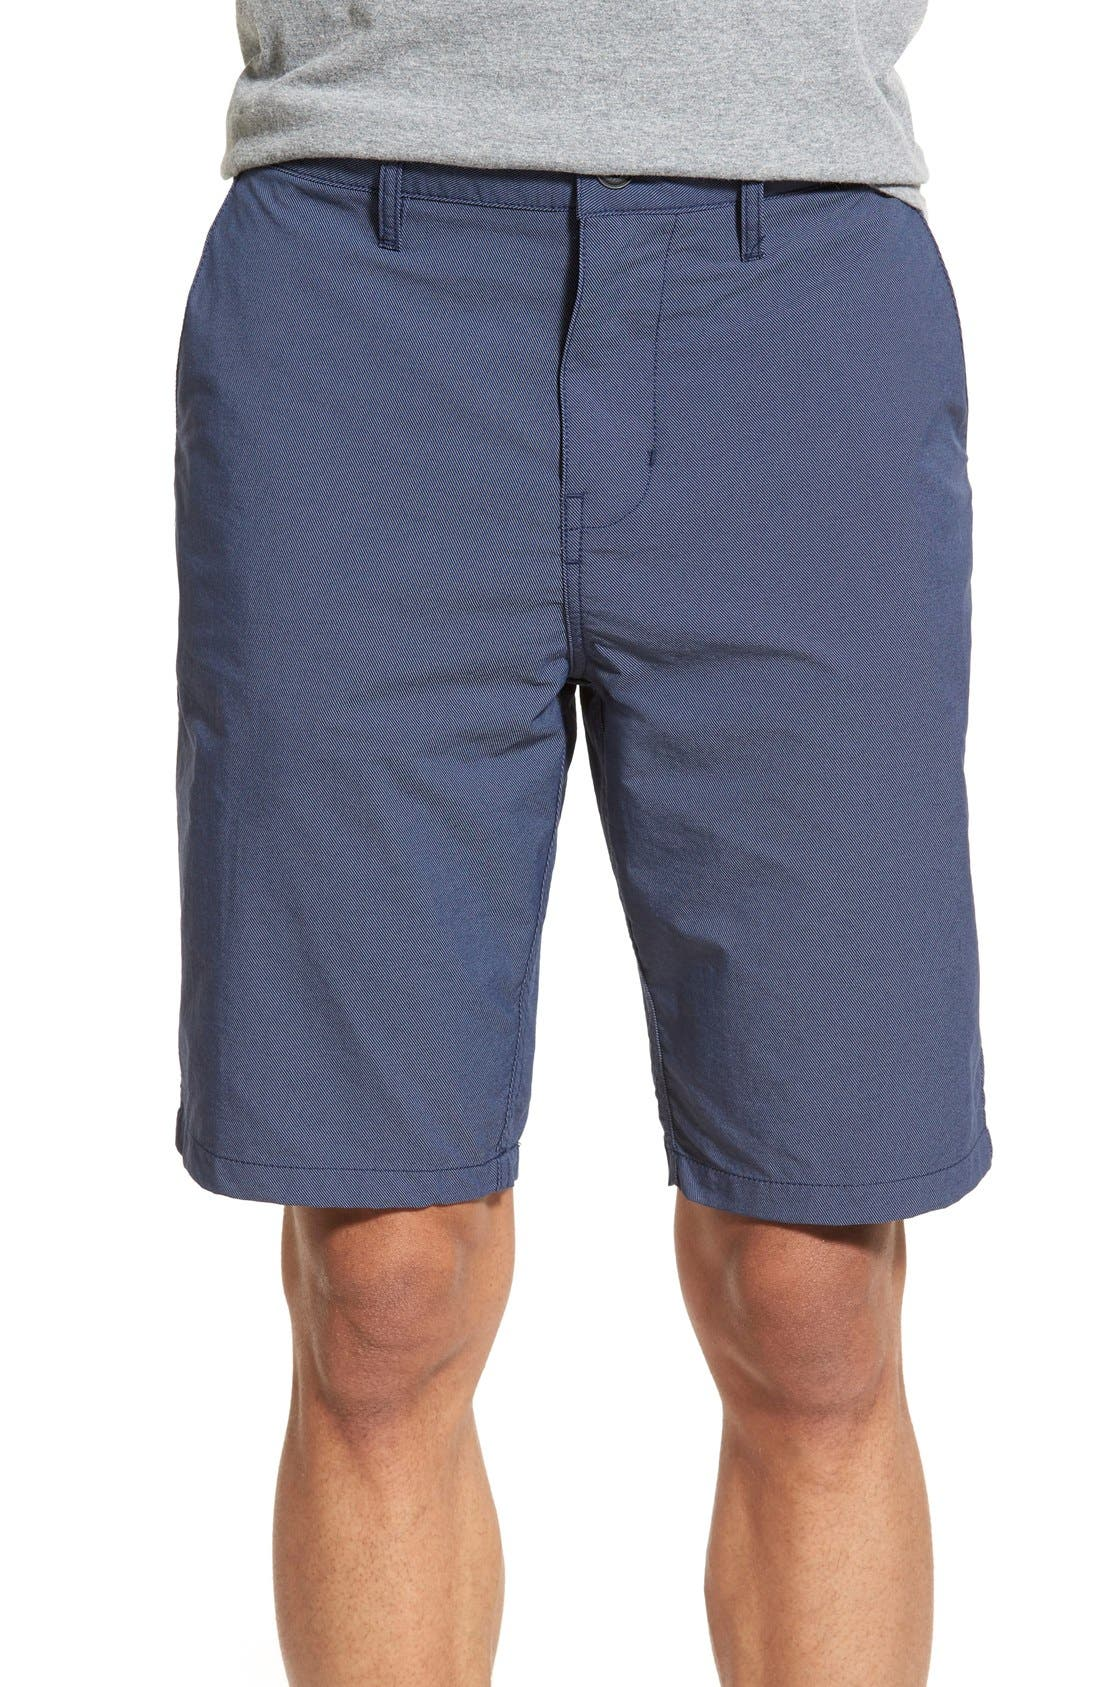 'Dry Out' Dri-FIT<sup>™</sup> Chino Shorts,                             Main thumbnail 11, color,